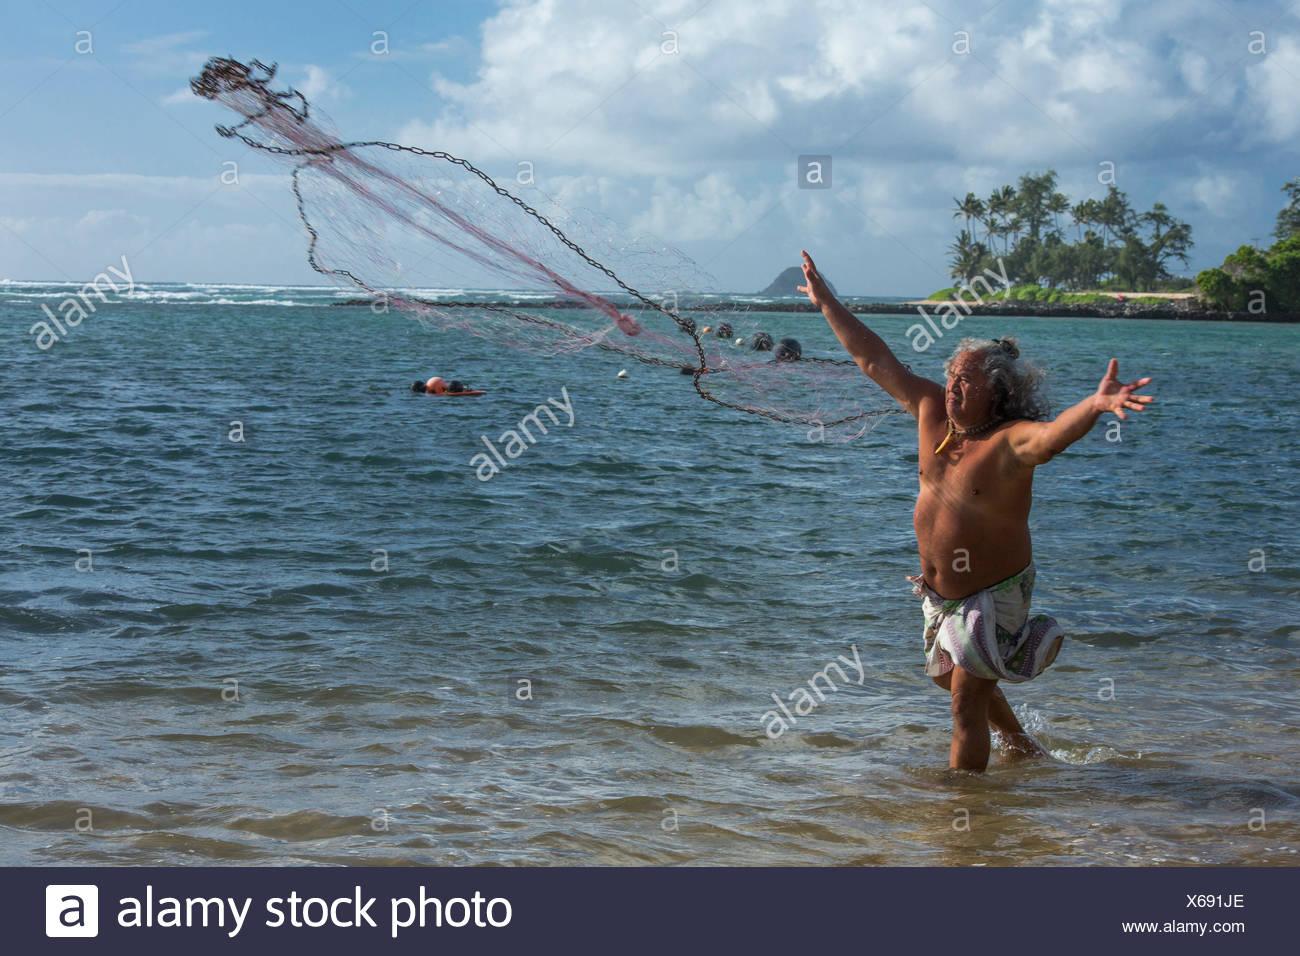 Molokai, lokale, Polynesian, kein Model-Release, Mann, Angeln, USA, Hawaii, Amerika, Fischer, Stockfoto